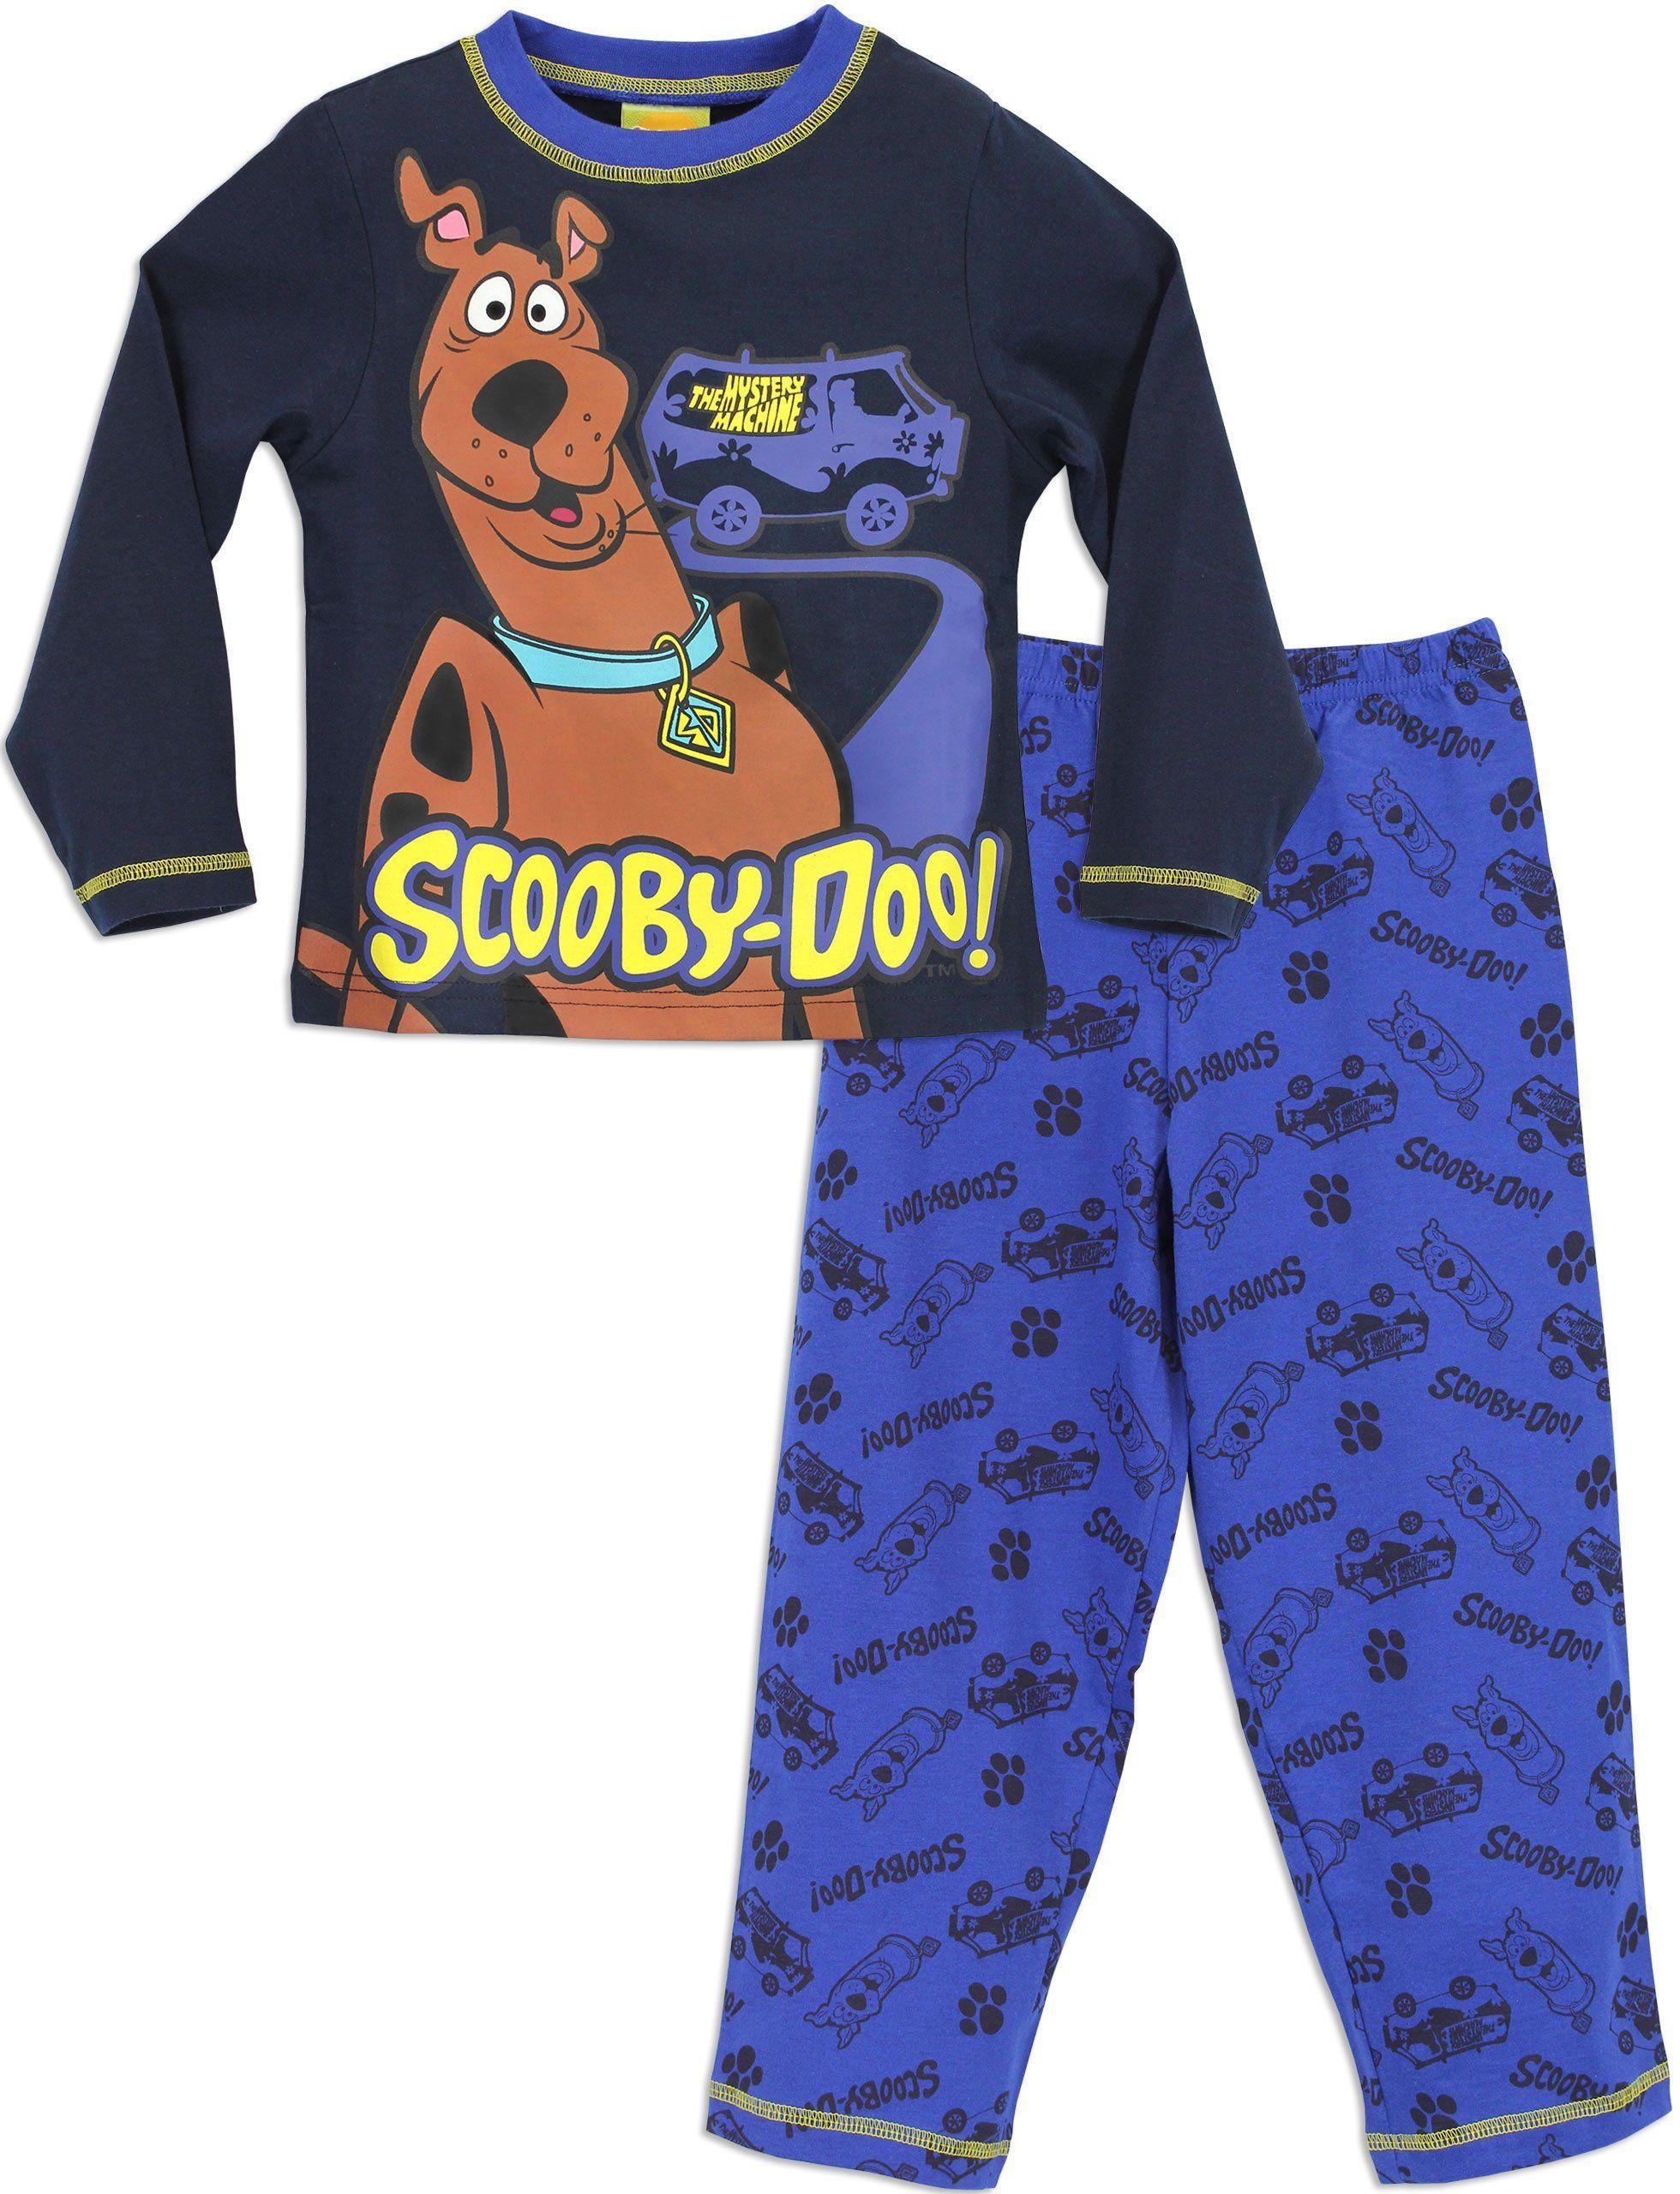 bfc3c3ceb7 Character Boys  Scooby Doo Pajamas Mystery Machine